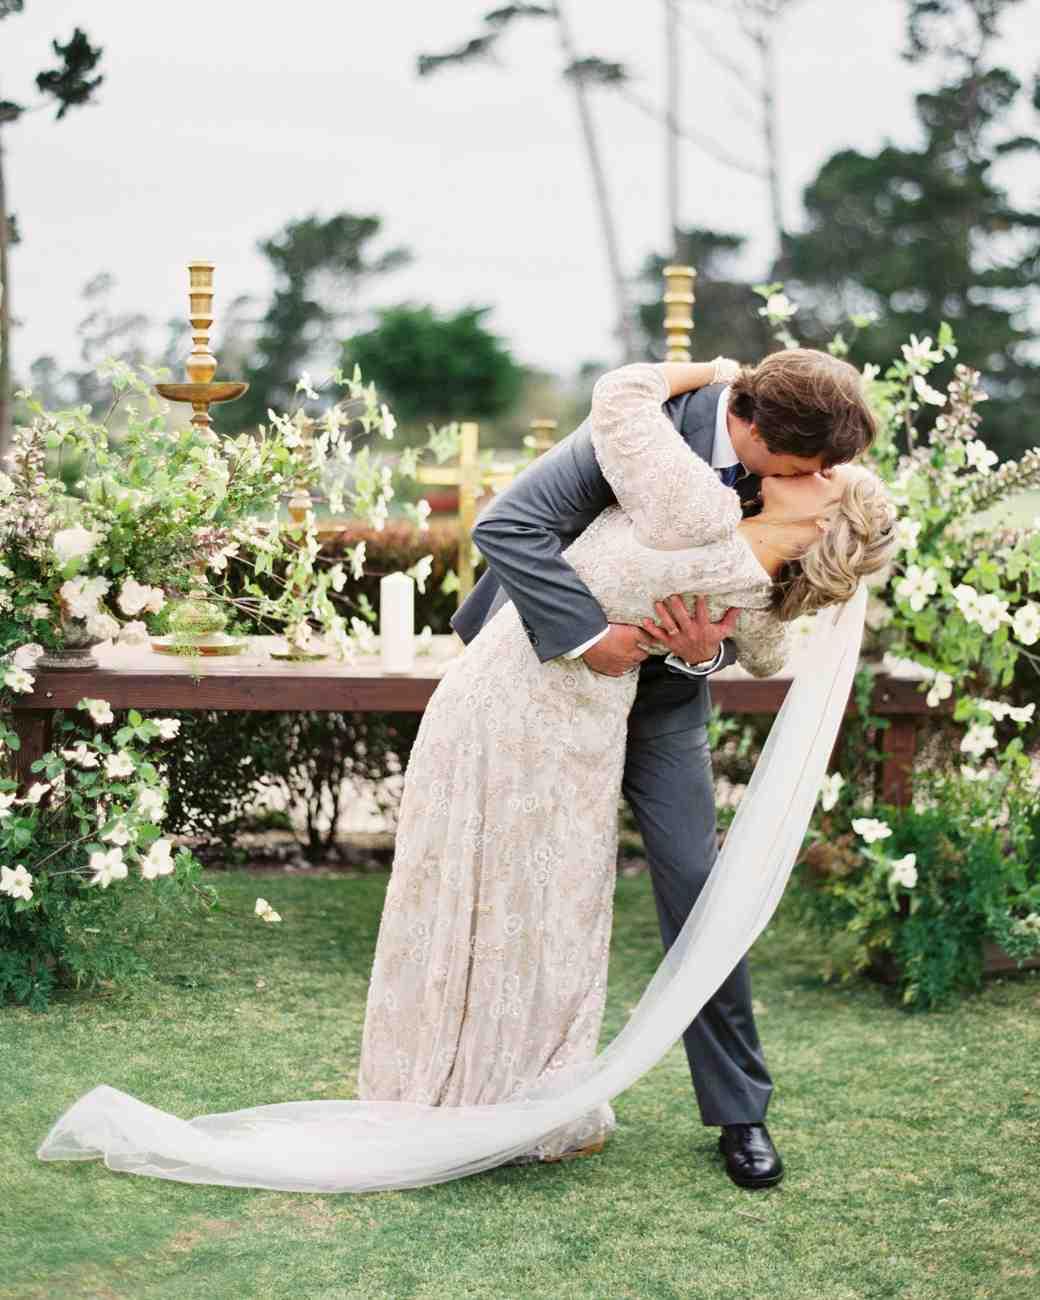 ginny-andrew-wedding-ceremony-0623-s112676-0216.jpg